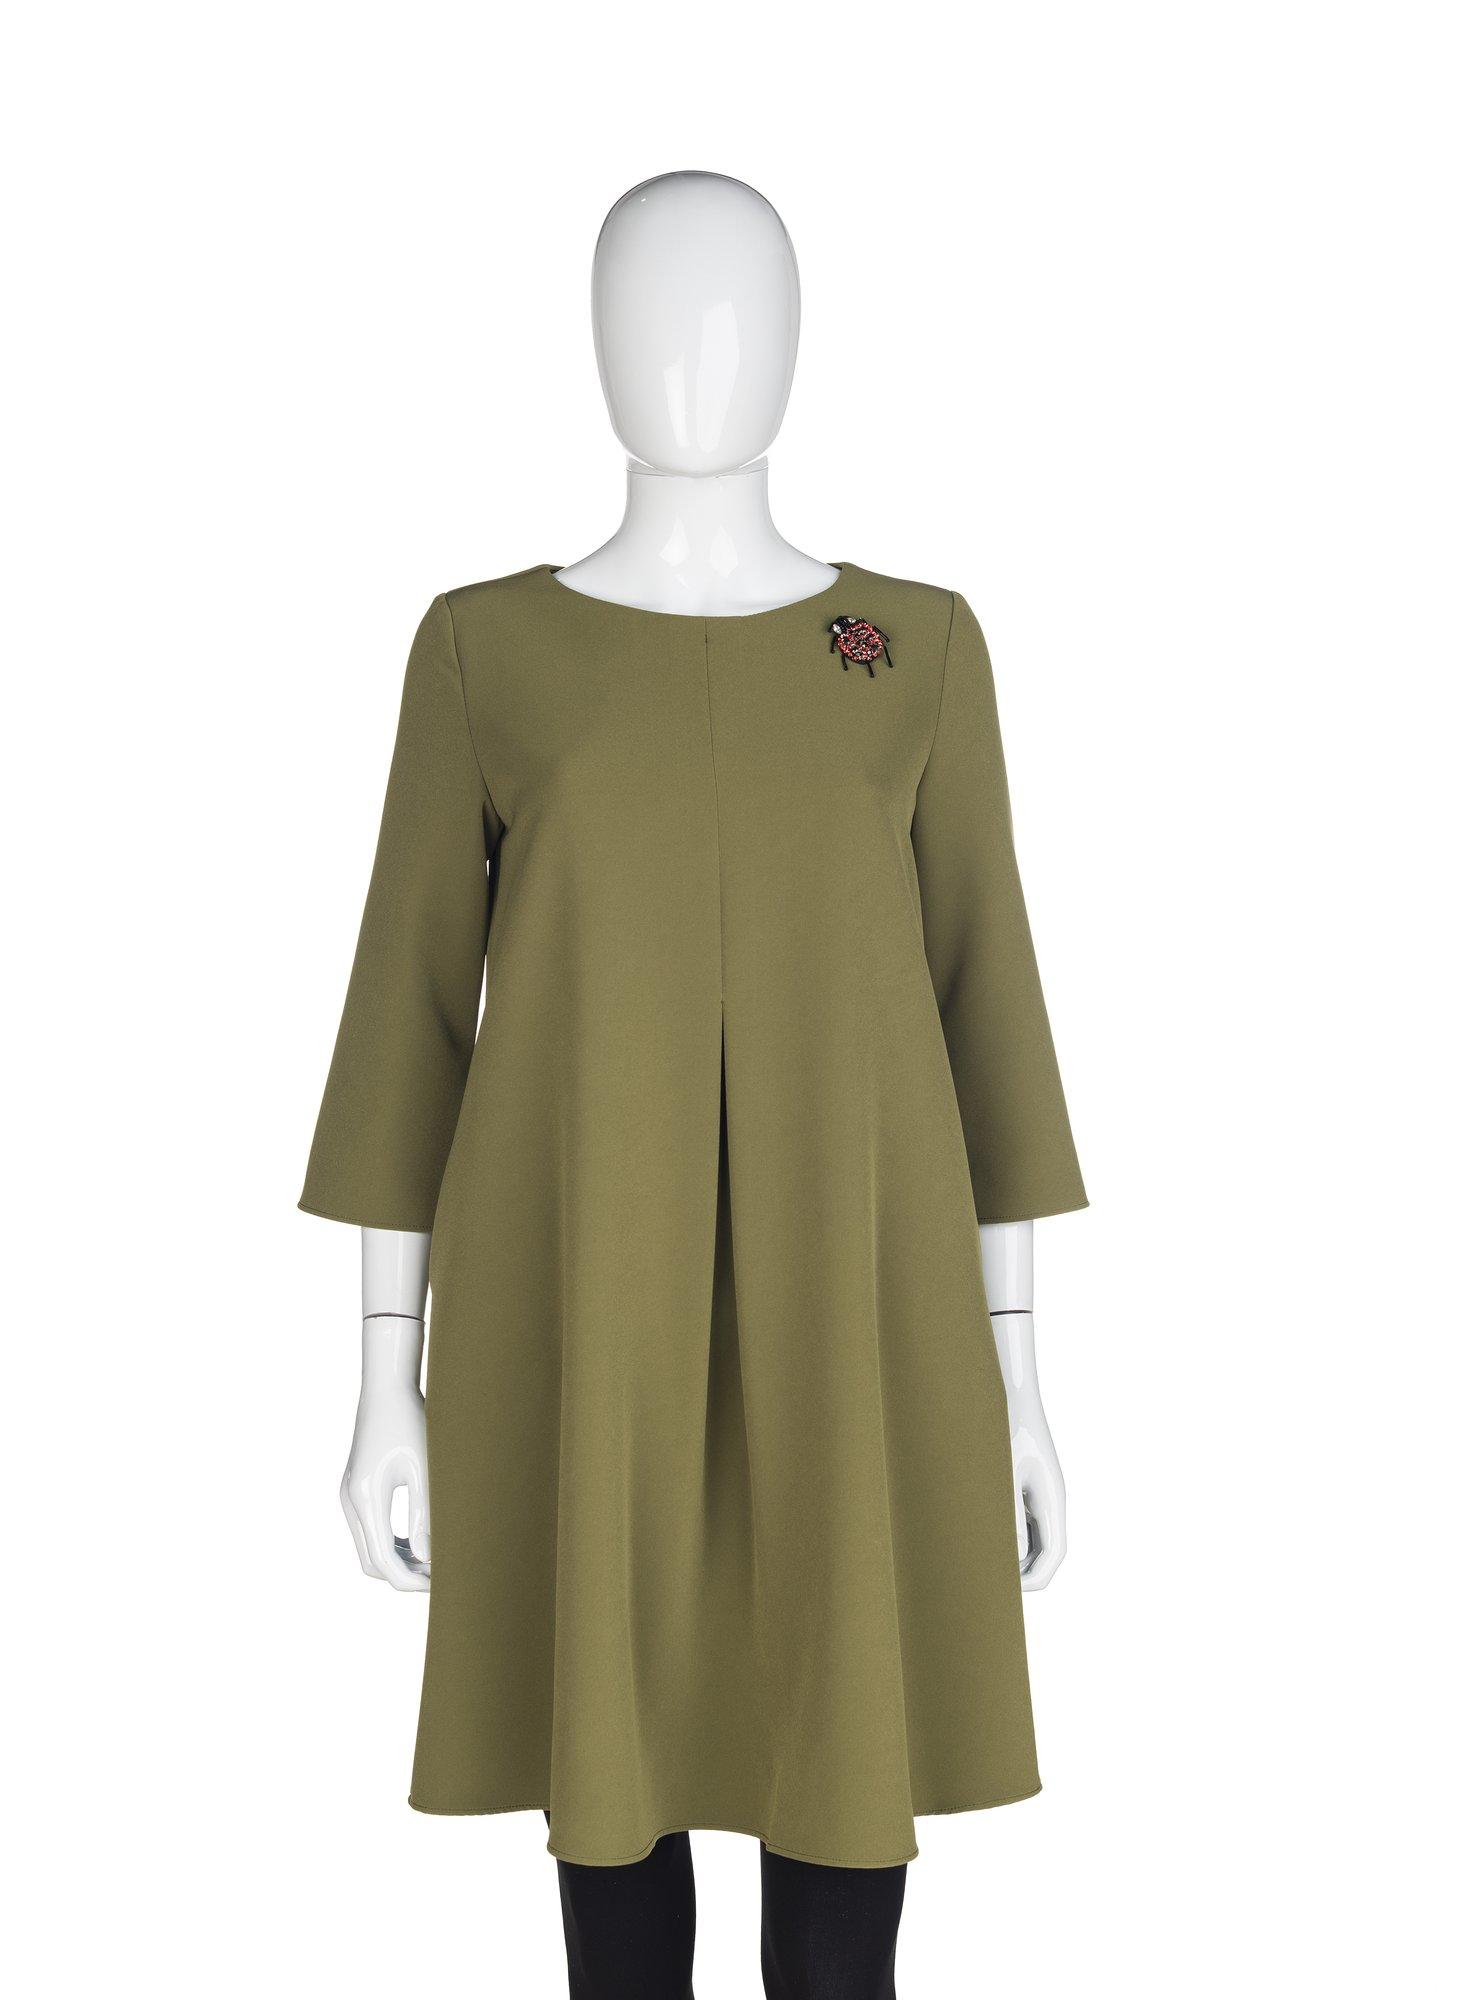 d13e5d9ab9a3d Tiendas de moda de mujer en Coruña con venta online